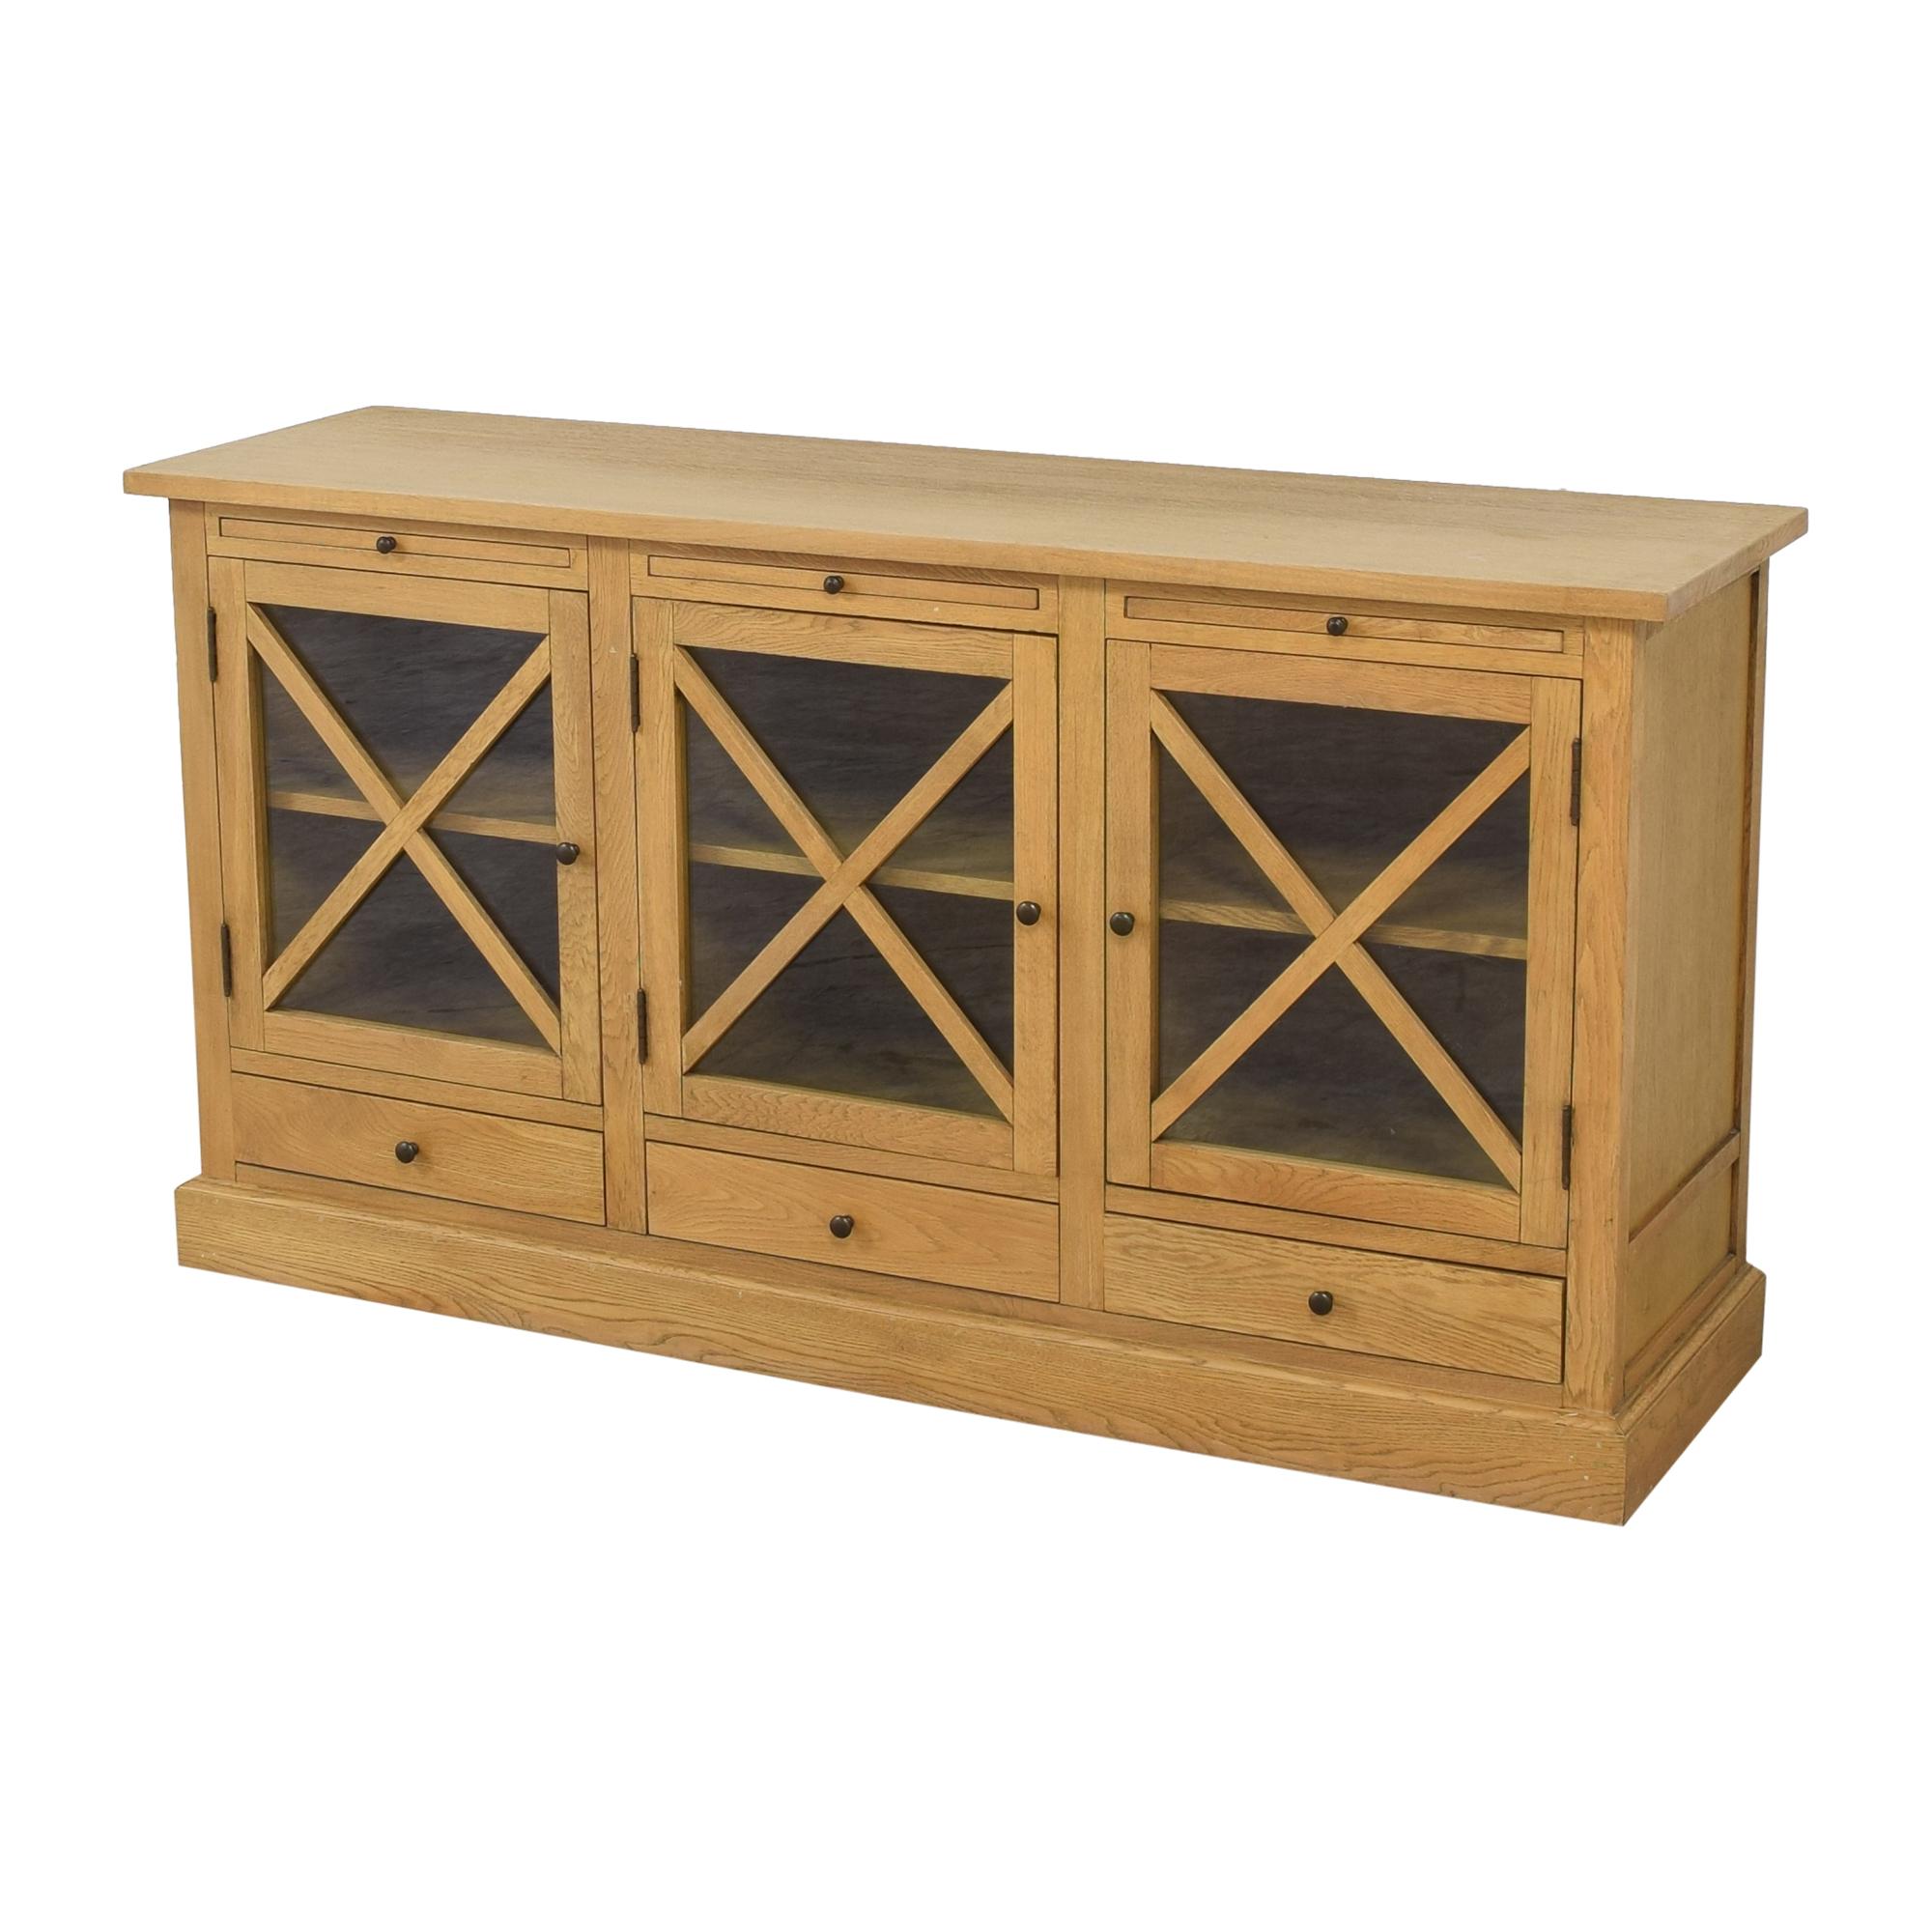 shop Ballard Designs Belgard Console Ballard Designs Cabinets & Sideboards